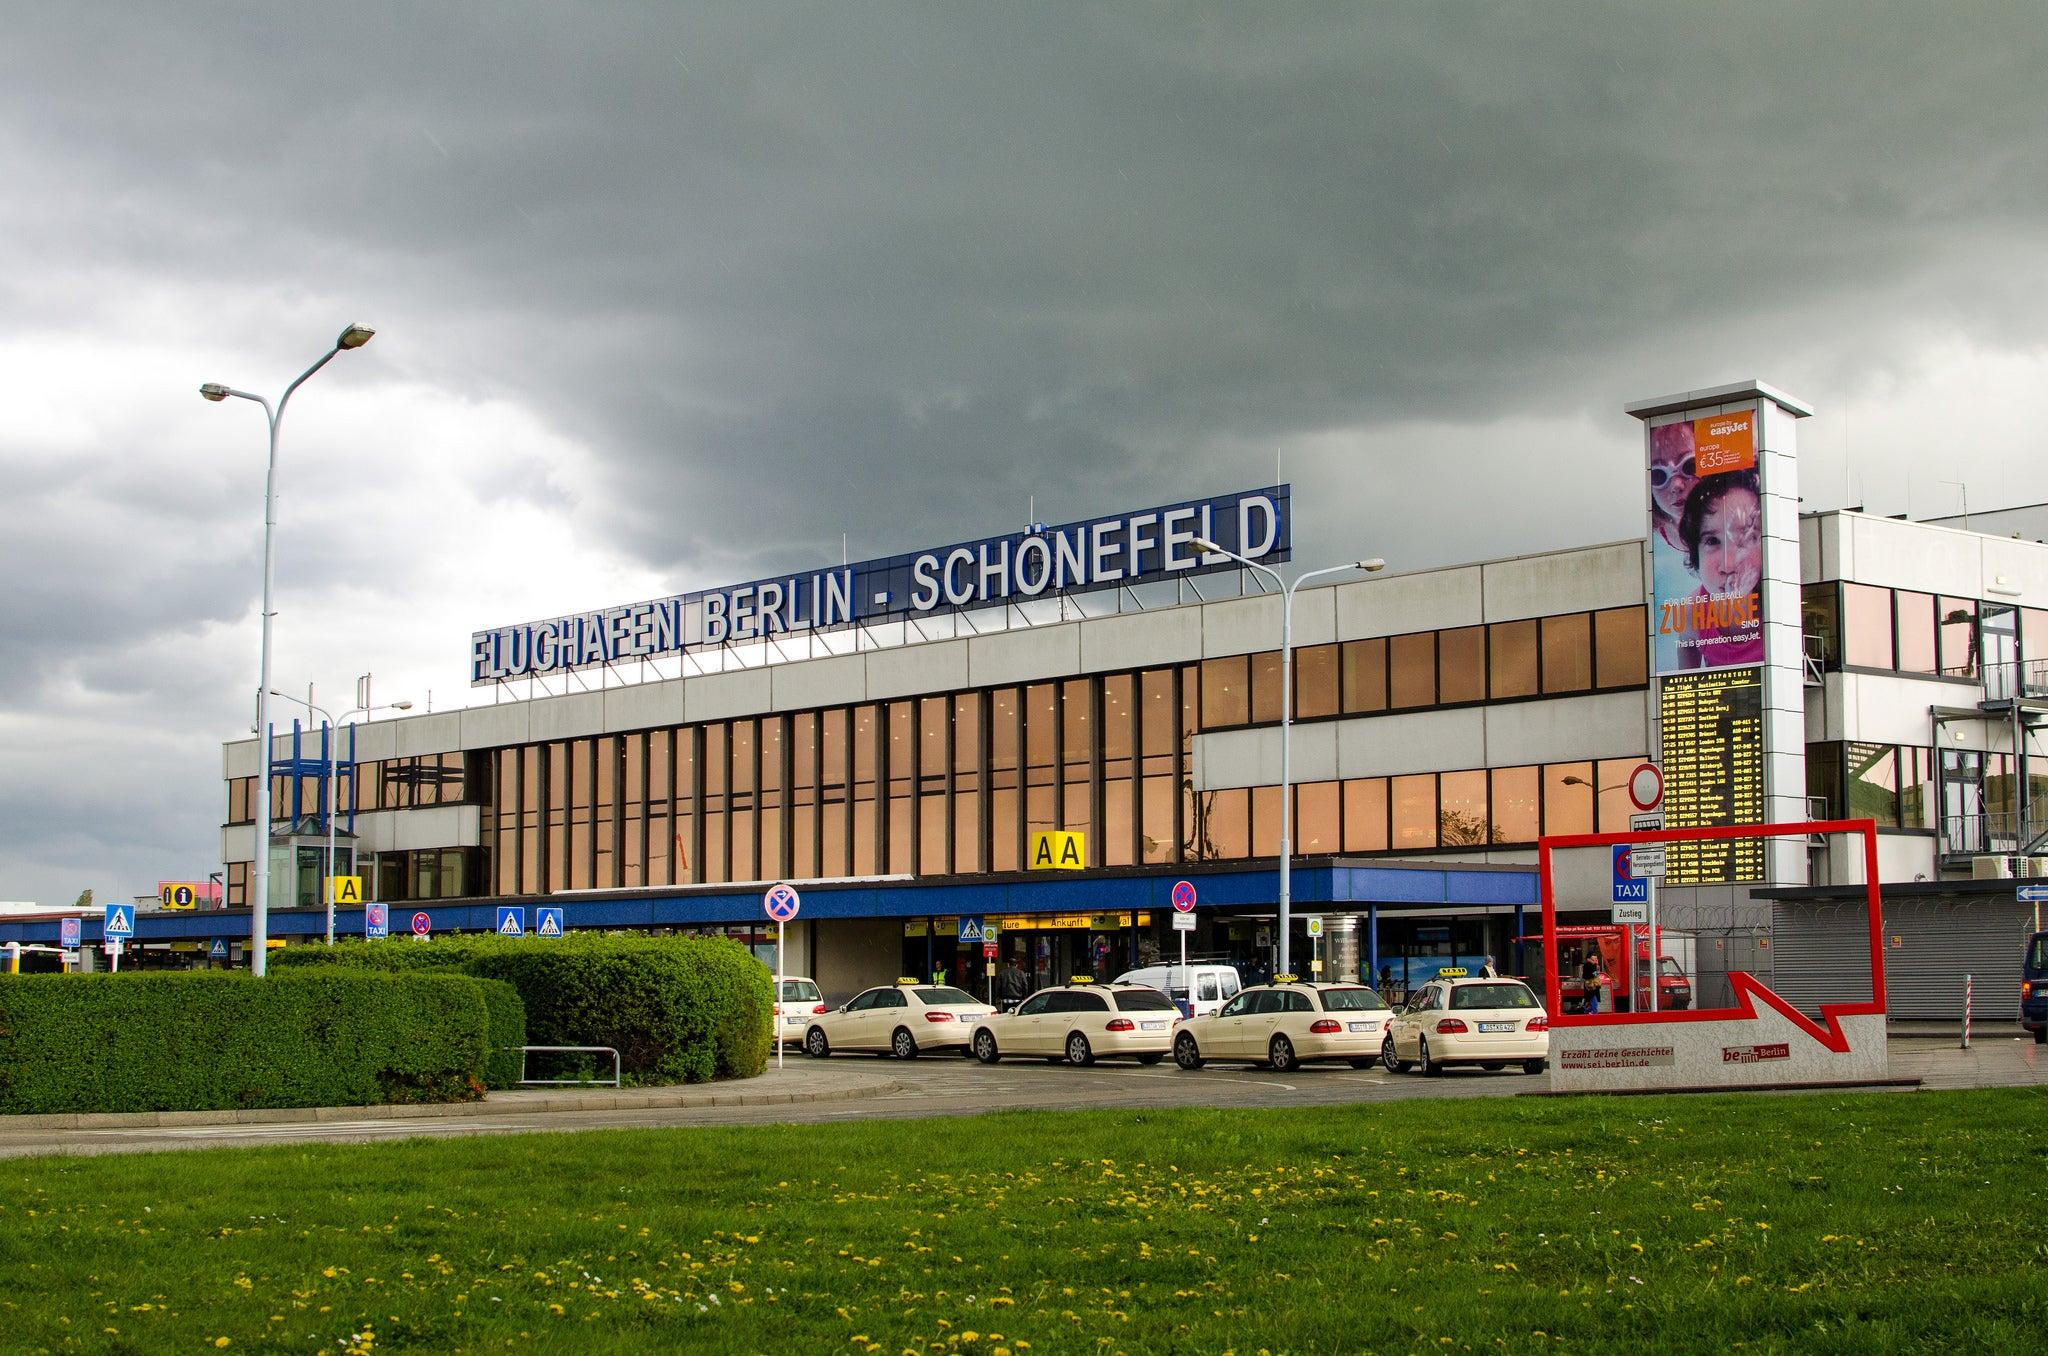 aeroporto berlino schonefeld